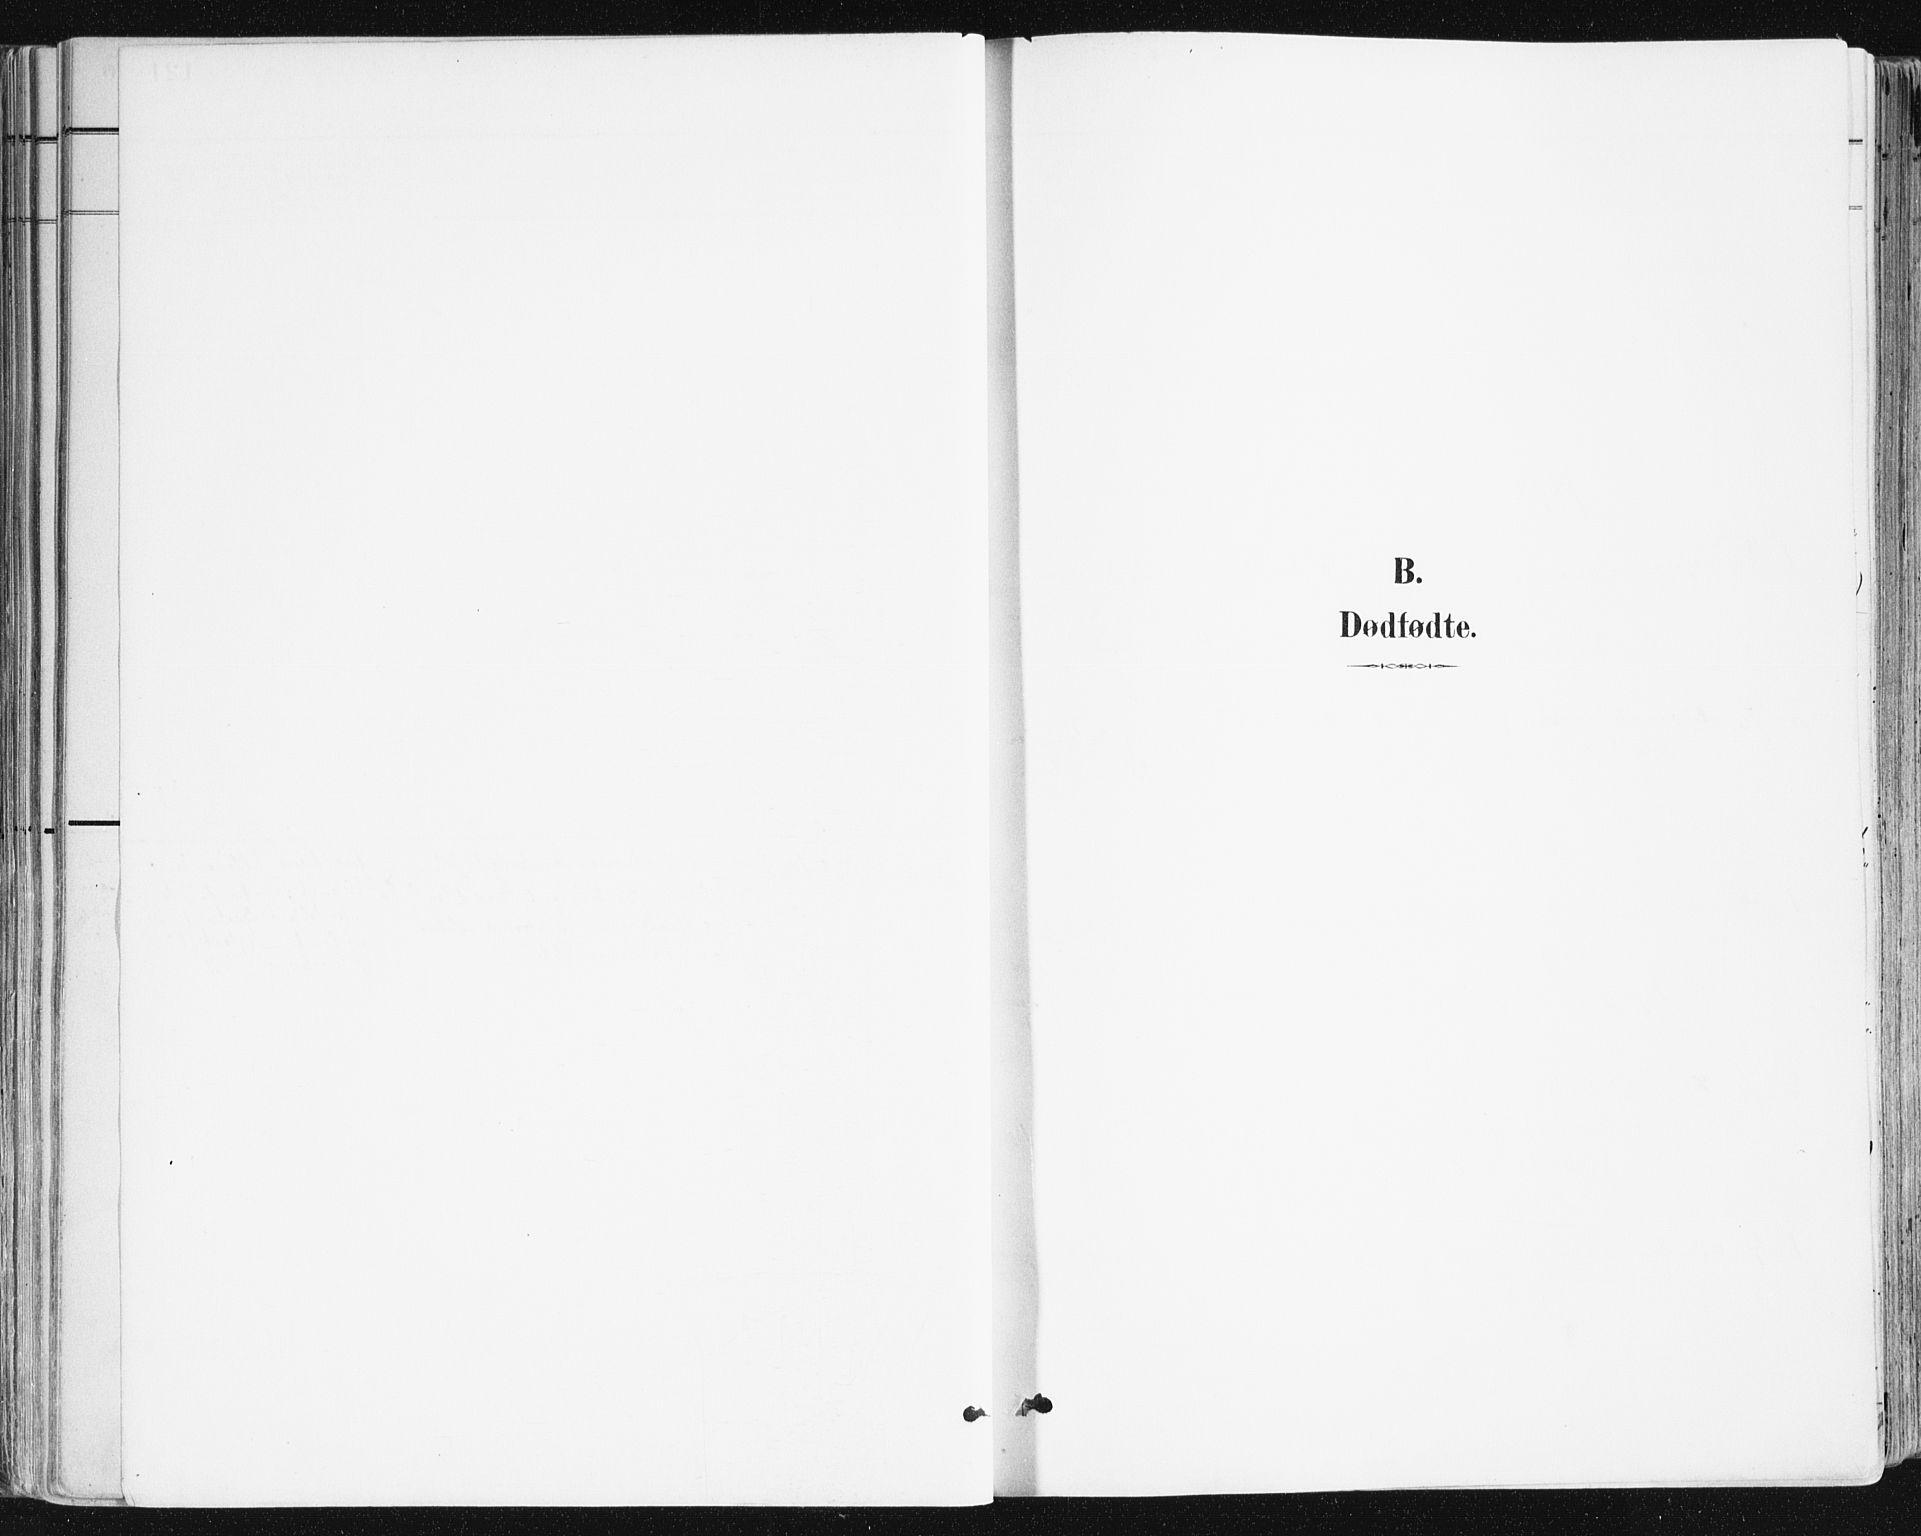 SAK, Hisøy sokneprestkontor, F/Fa/L0004: Ministerialbok nr. A 4, 1895-1917